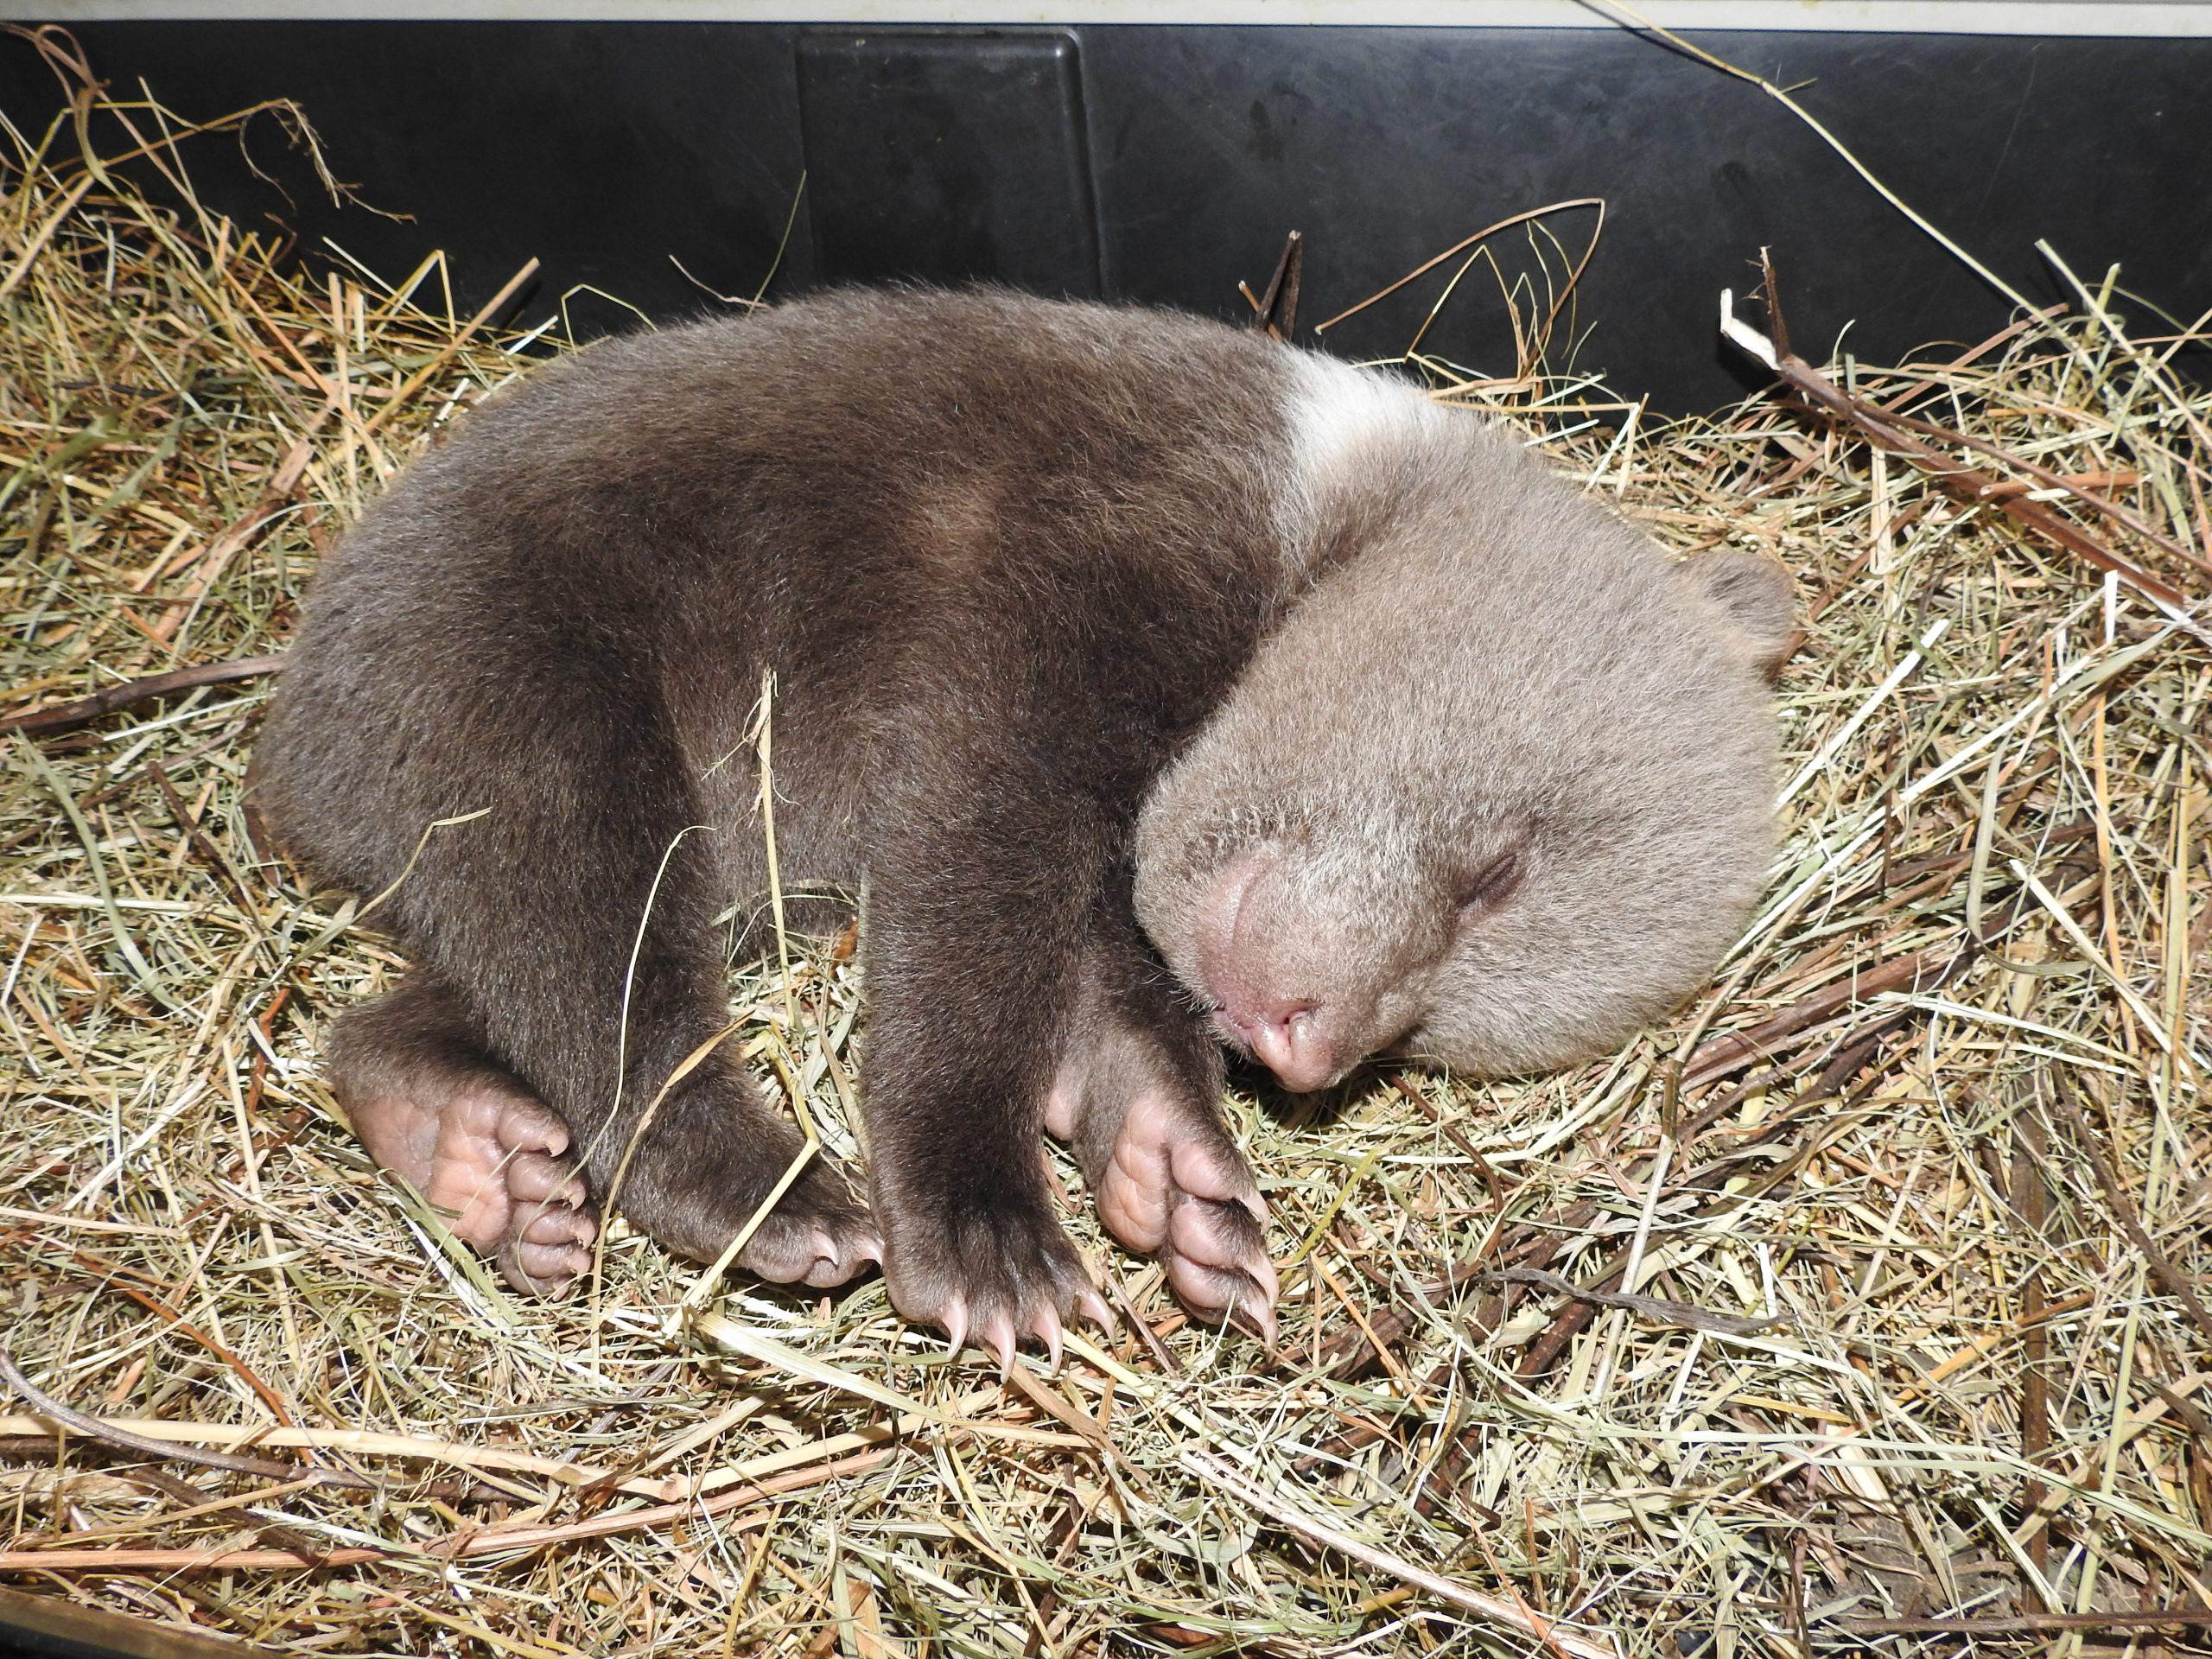 Orphaned brown bear cub